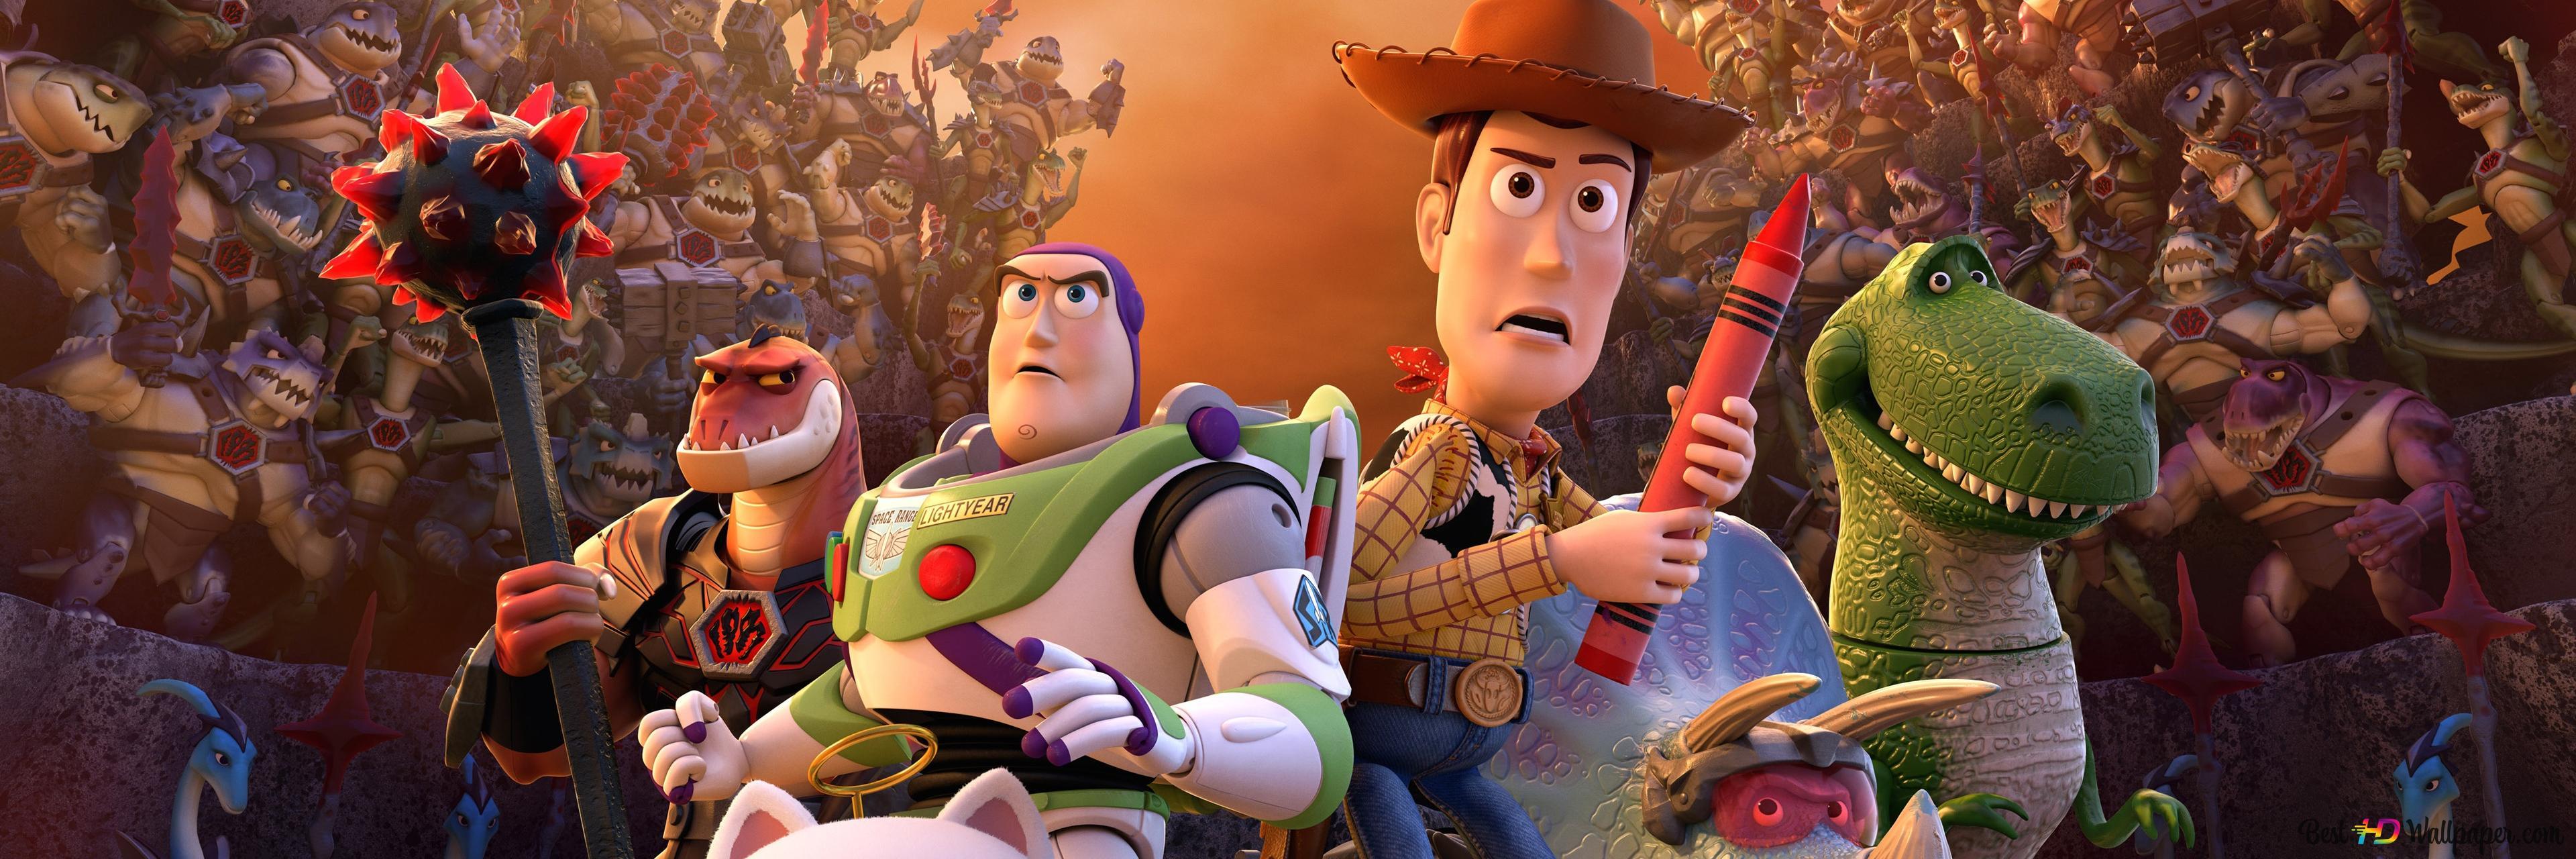 Toy Story Ten Cas Zapomenul Stazeni Hd Tapety